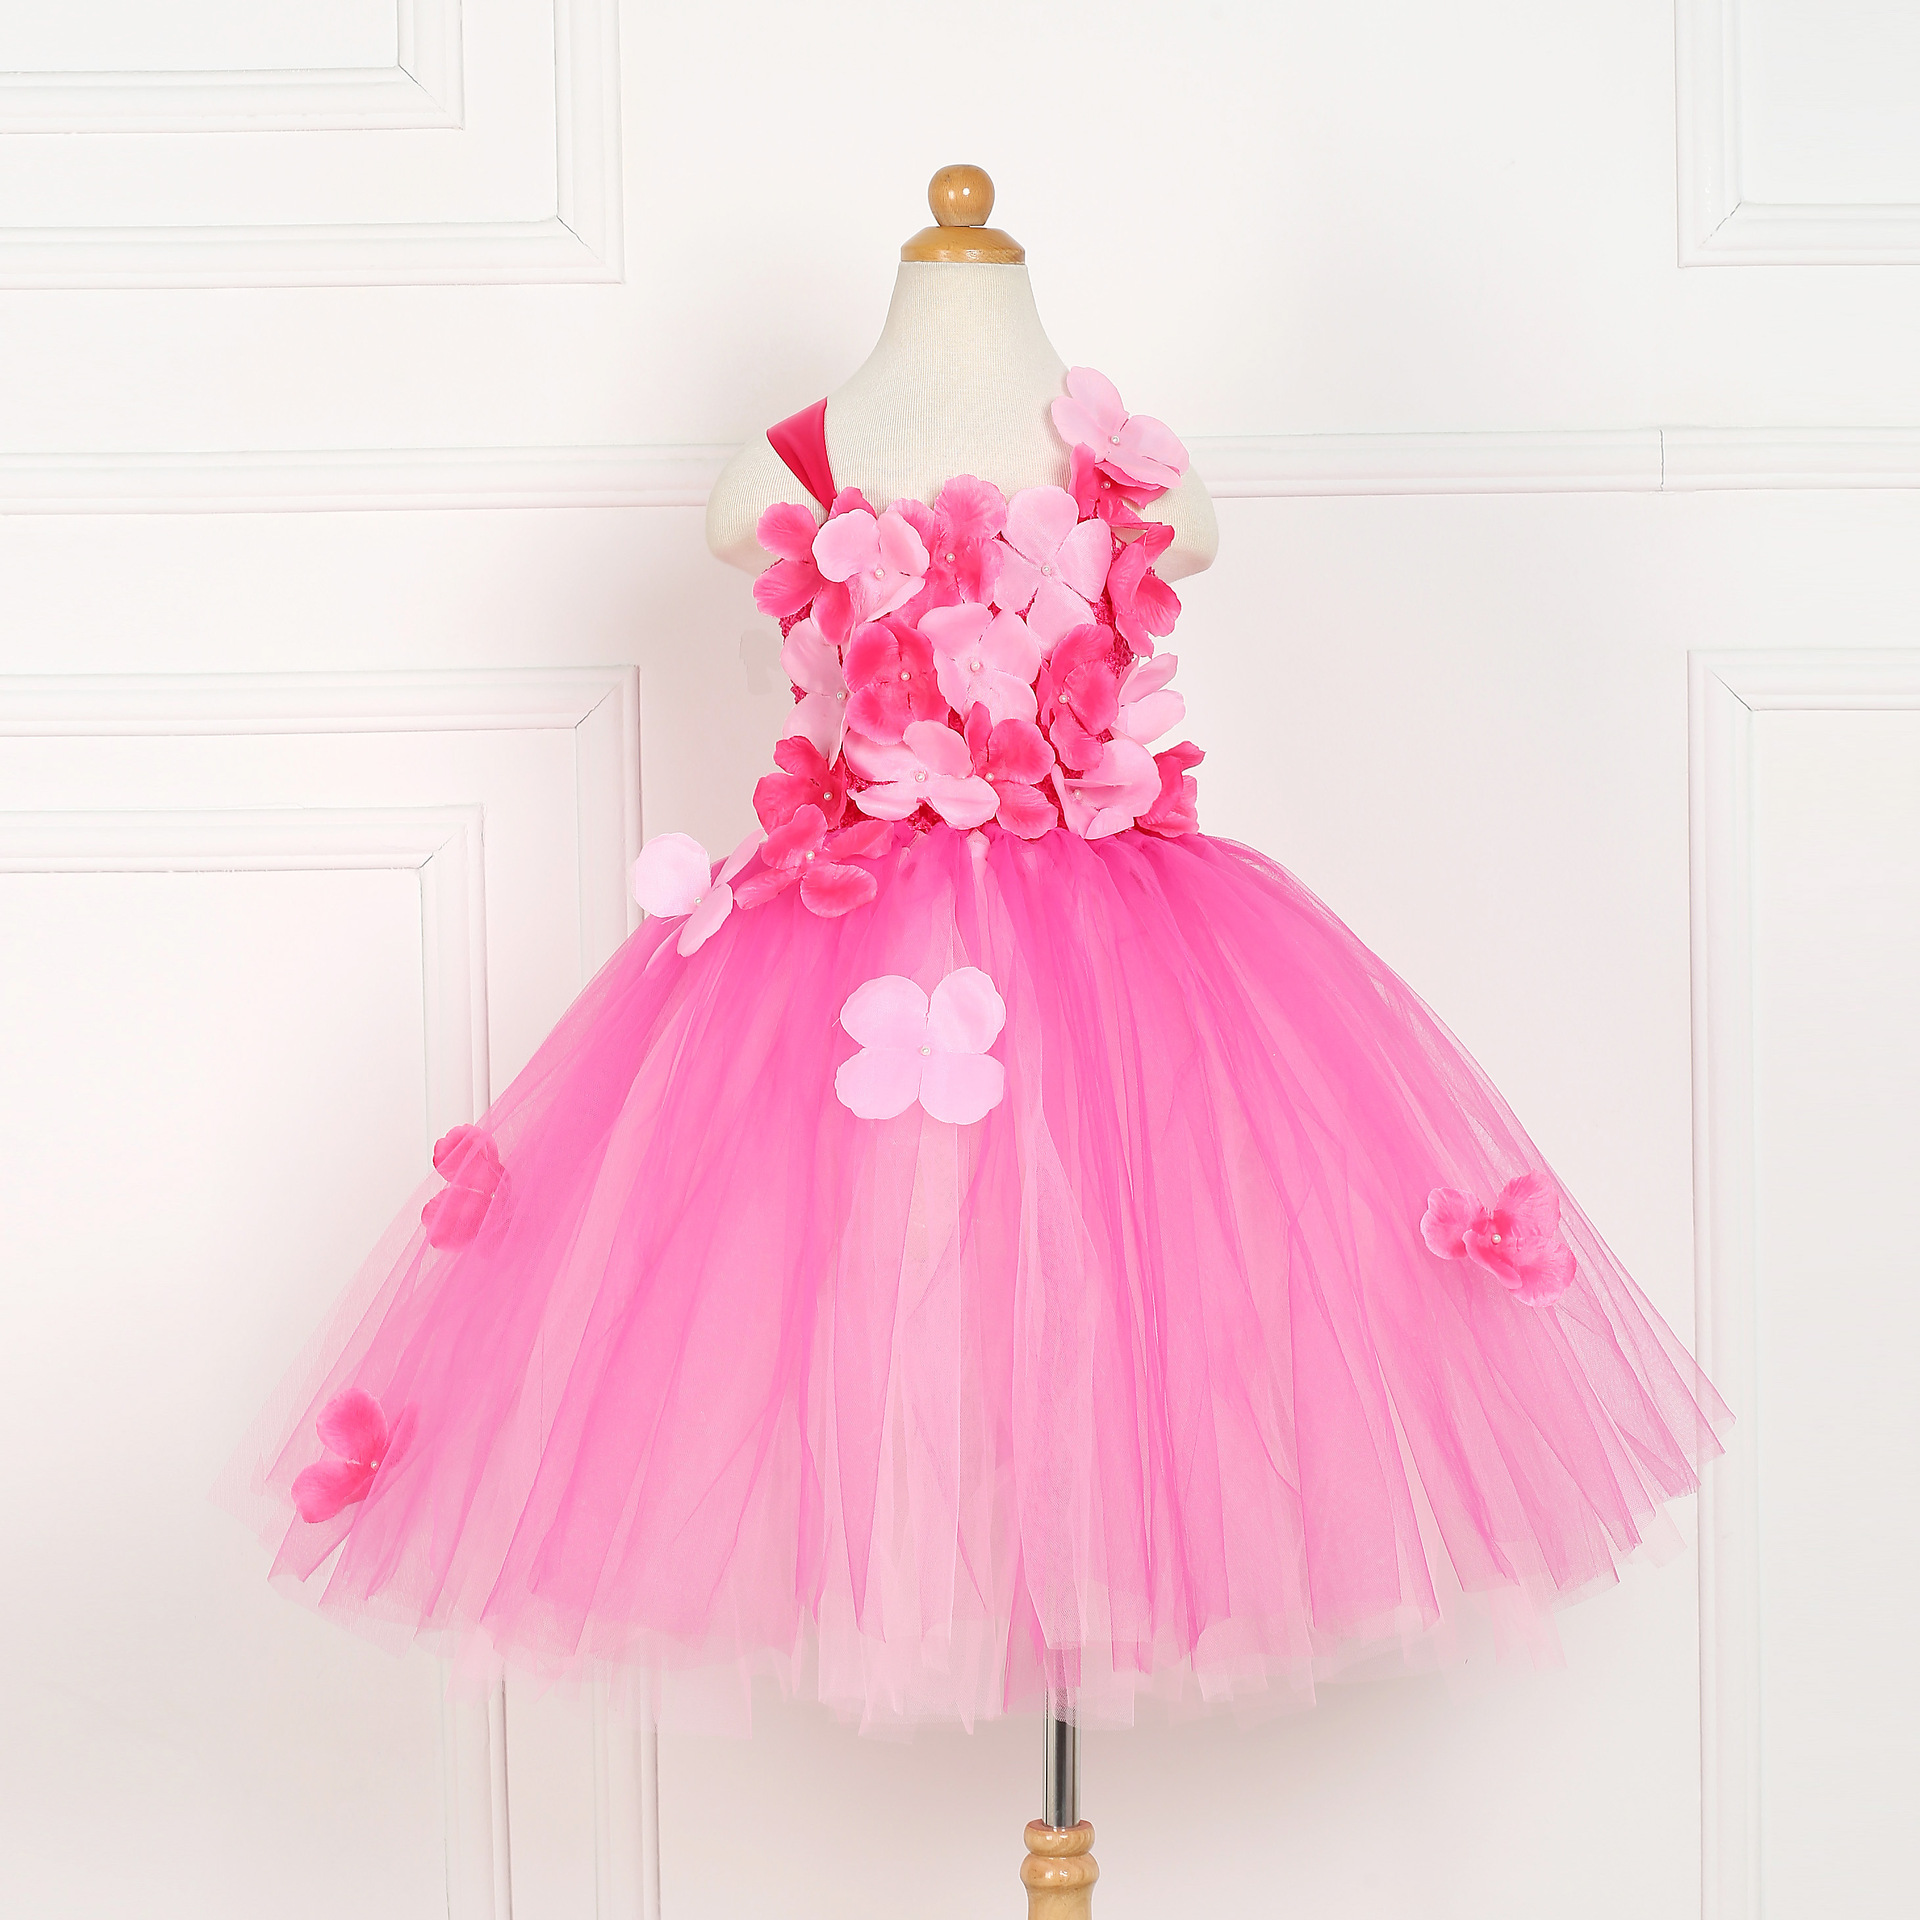 Children Girls Pink Small Flower Tutu Dress Princess Kids Birthday Party Dress Girls Christmas Halloween Cosplay Costume 1-12y